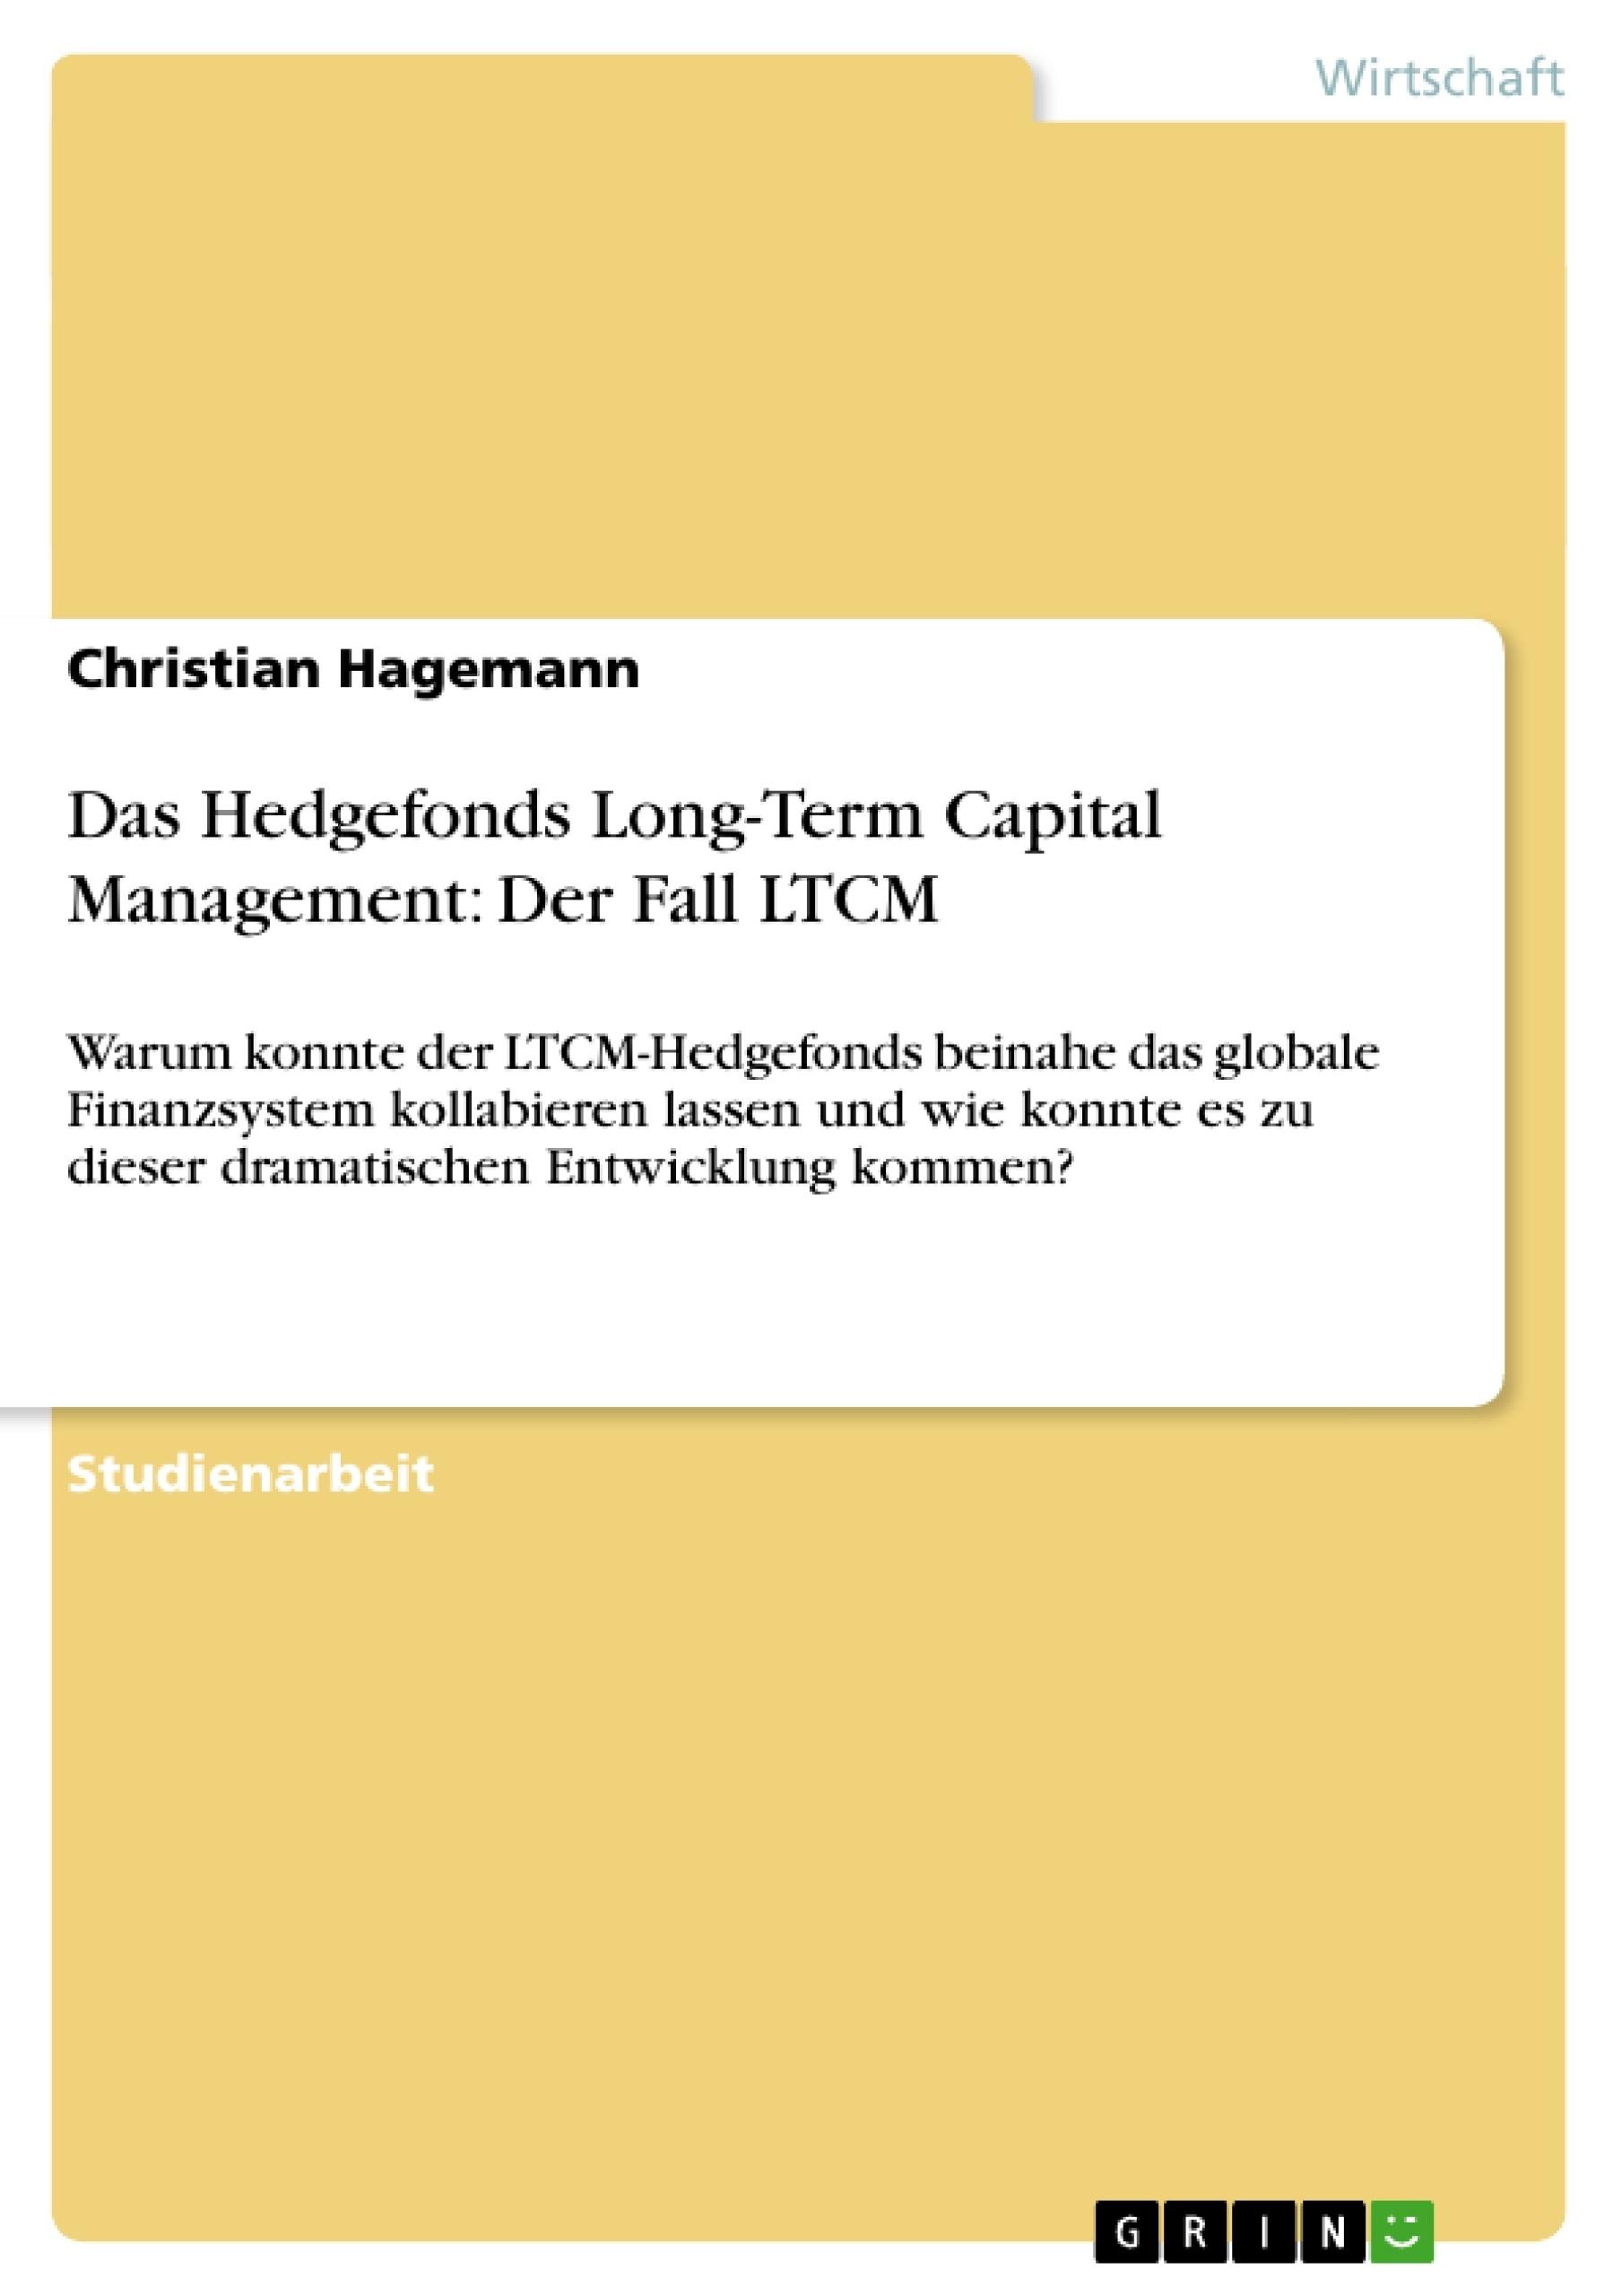 Titel: Das Hedgefonds Long-Term Capital Management: Der Fall LTCM